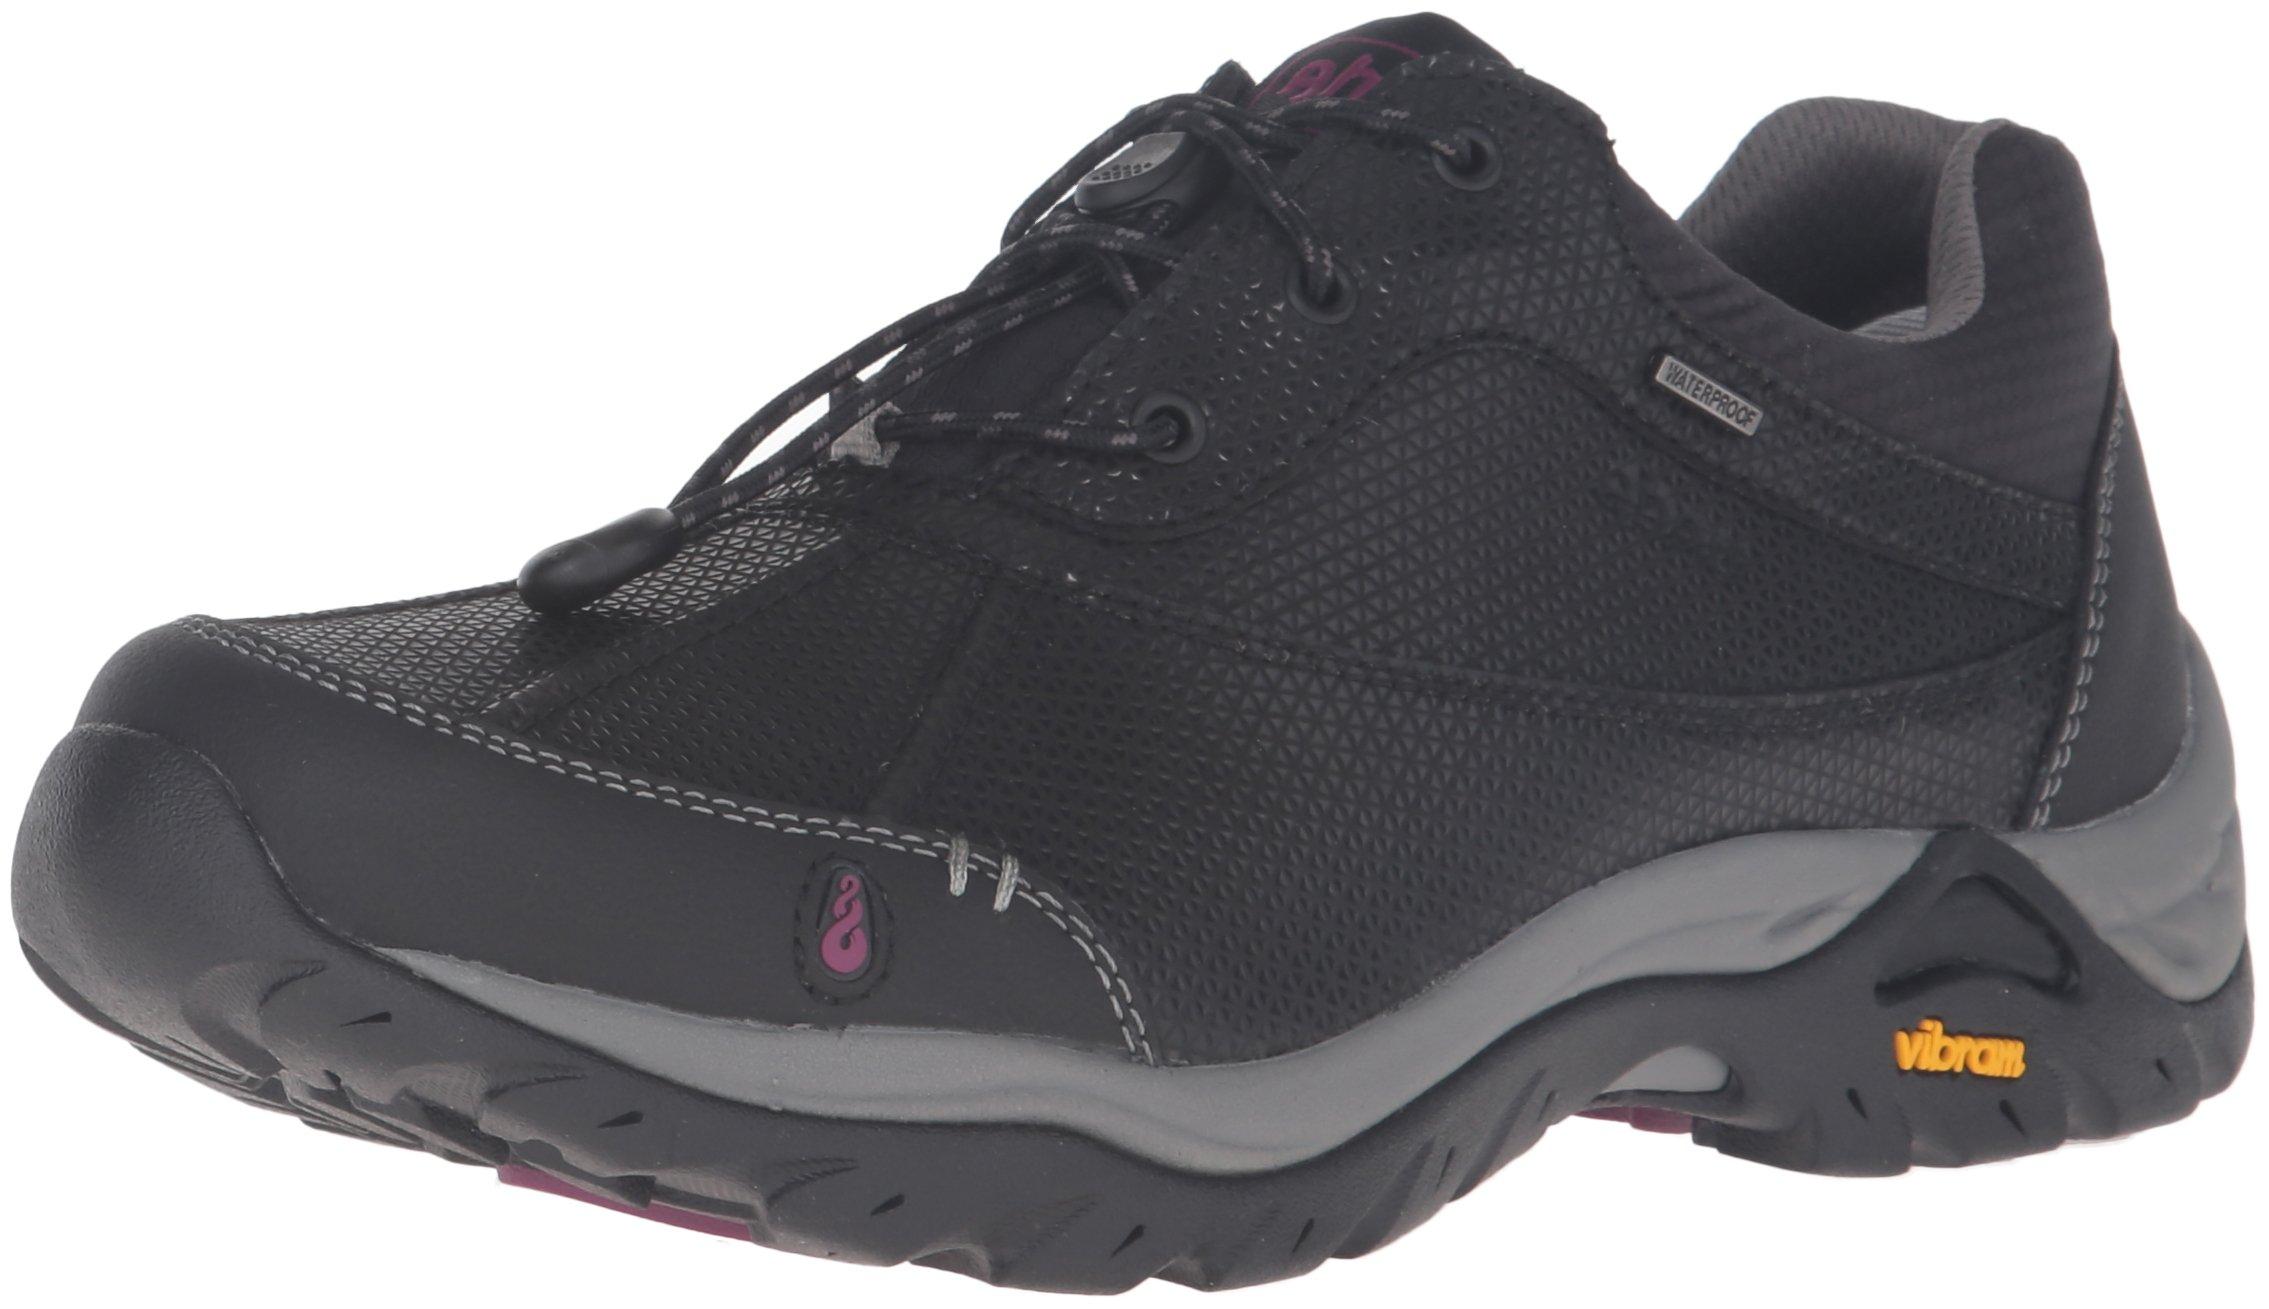 Ahnu Women's Calaveras Waterproof Hiking Shoe, Black, 9 M US